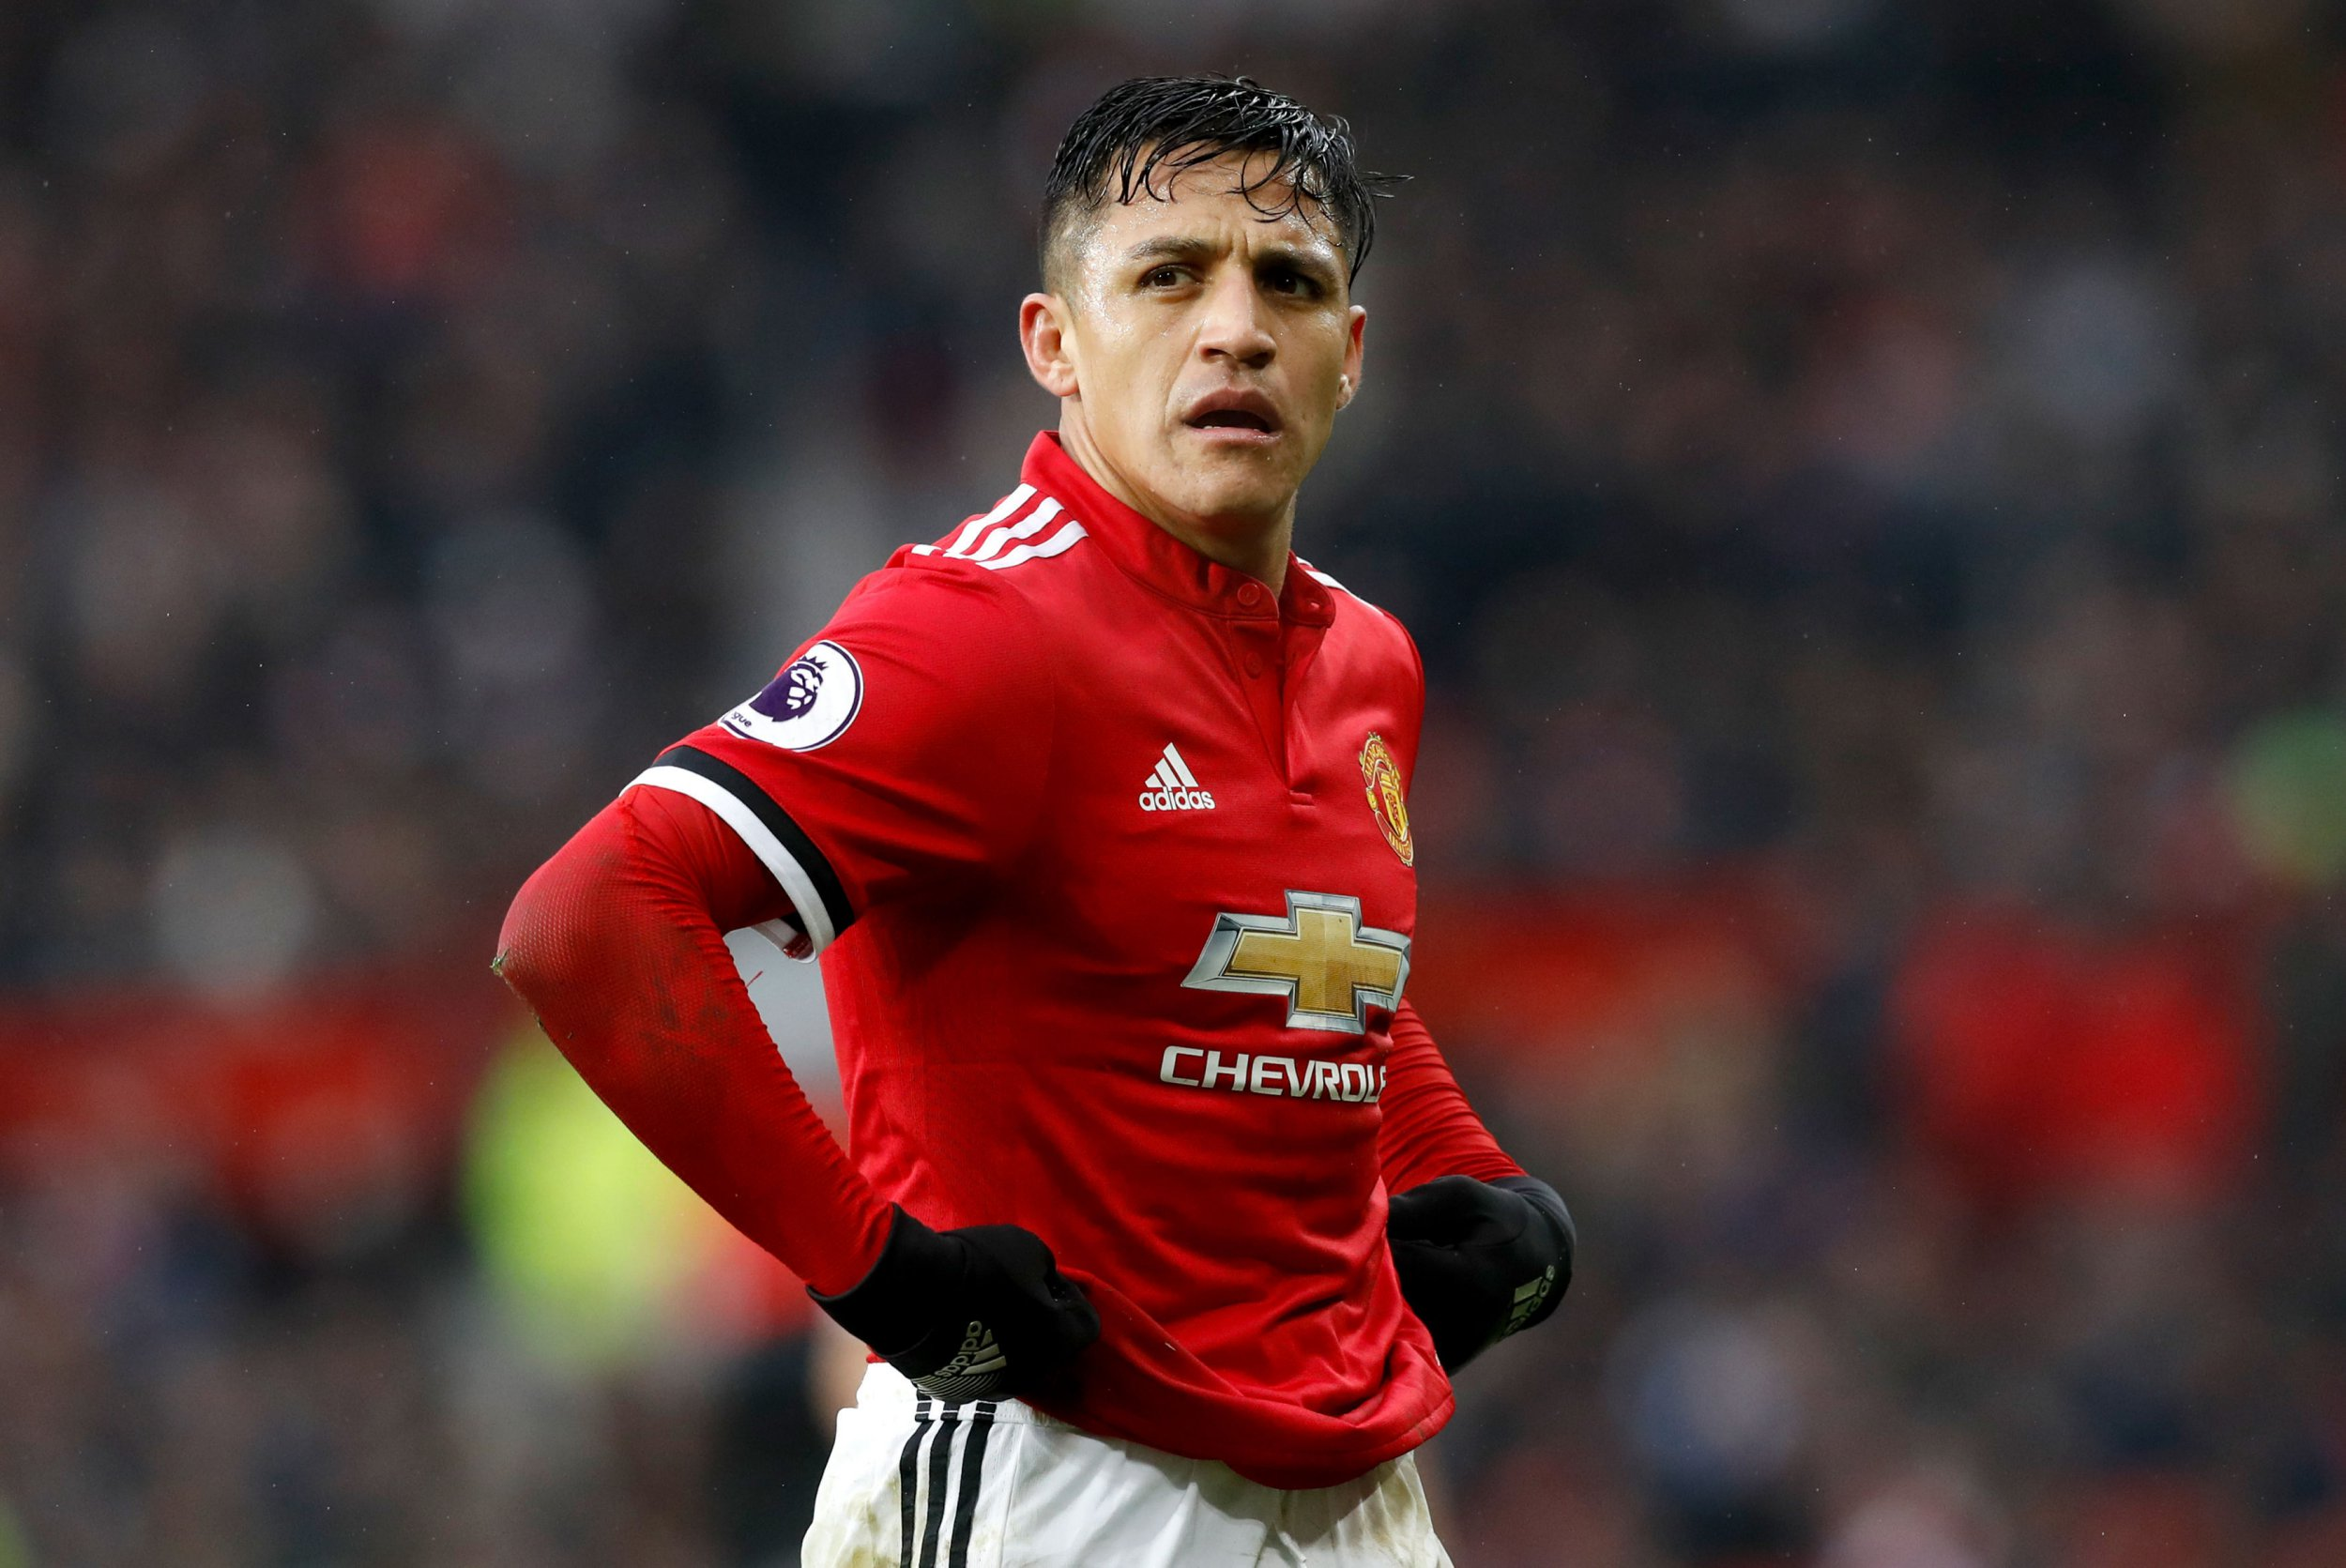 Jose Mourinho reveals the advantage Alexis Sanchez has over Romelu Lukaku at Manchester United